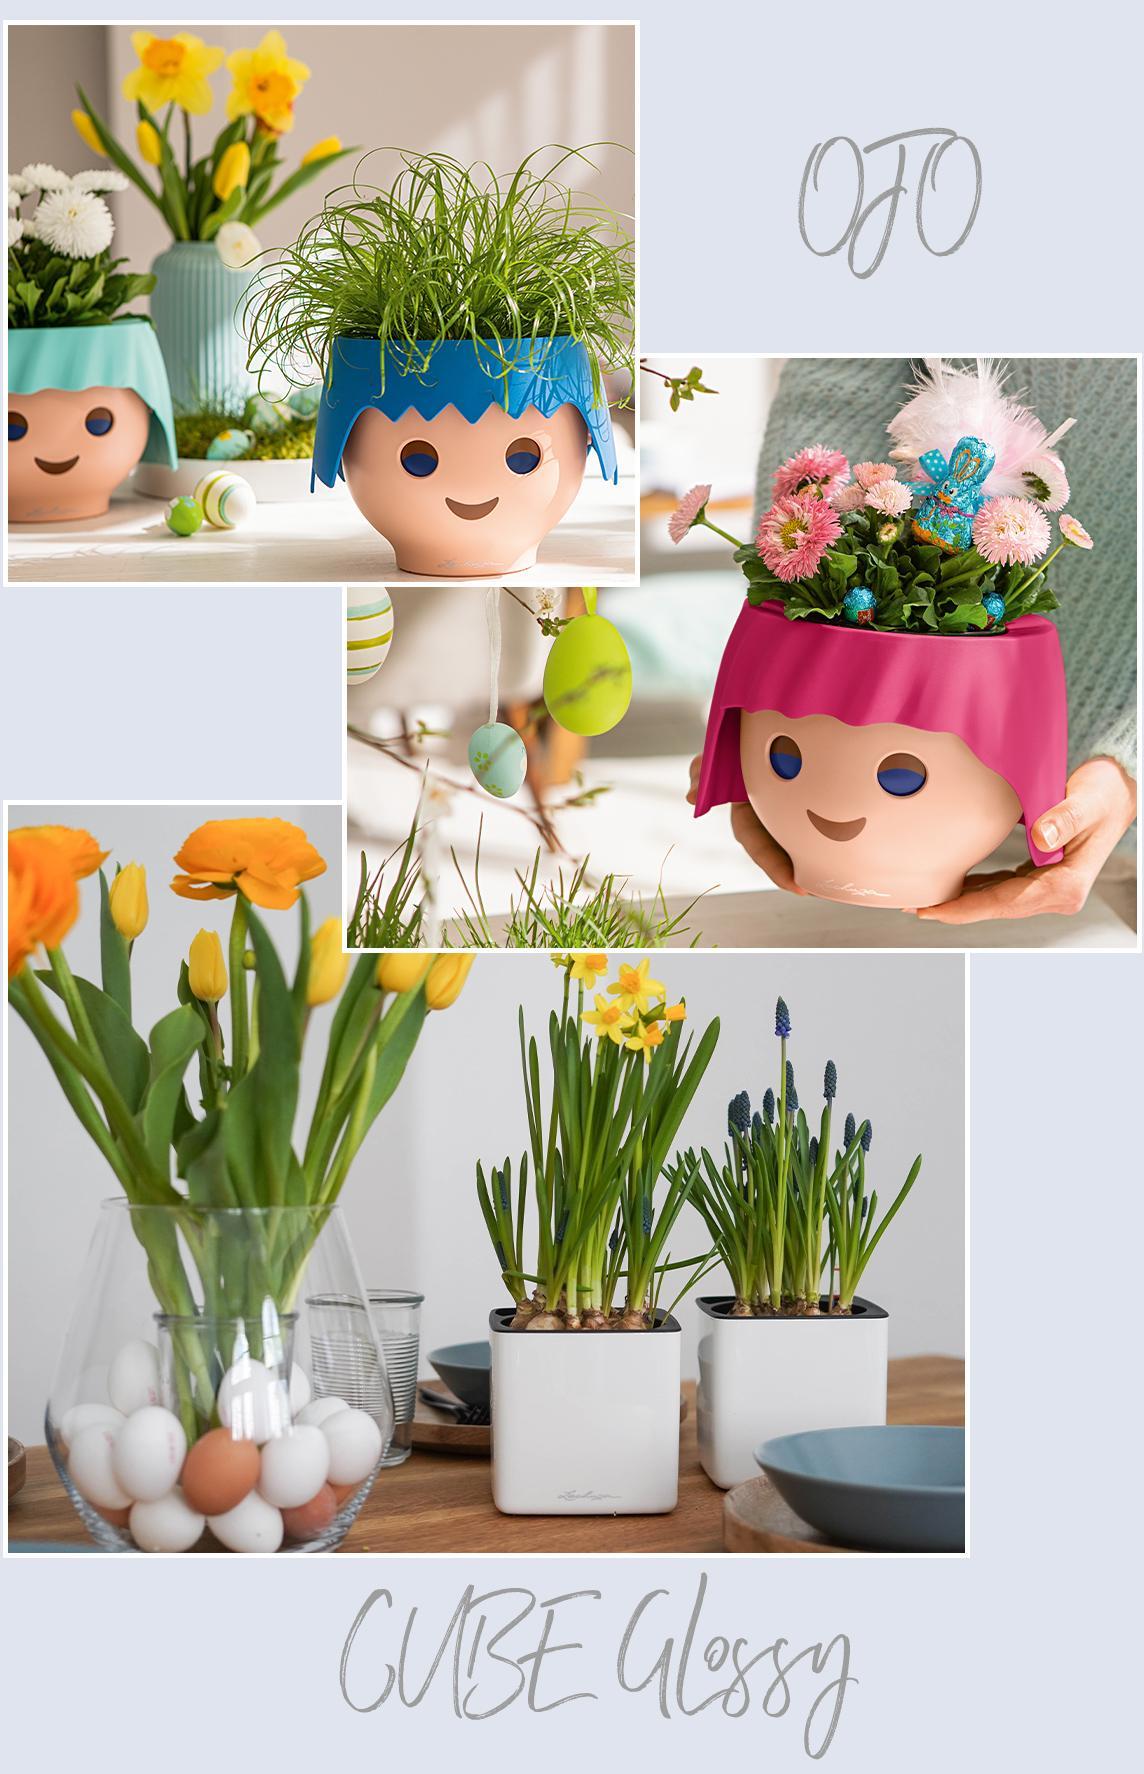 'Maceteros de LECHUZA en forma de cabezas de Playmobil